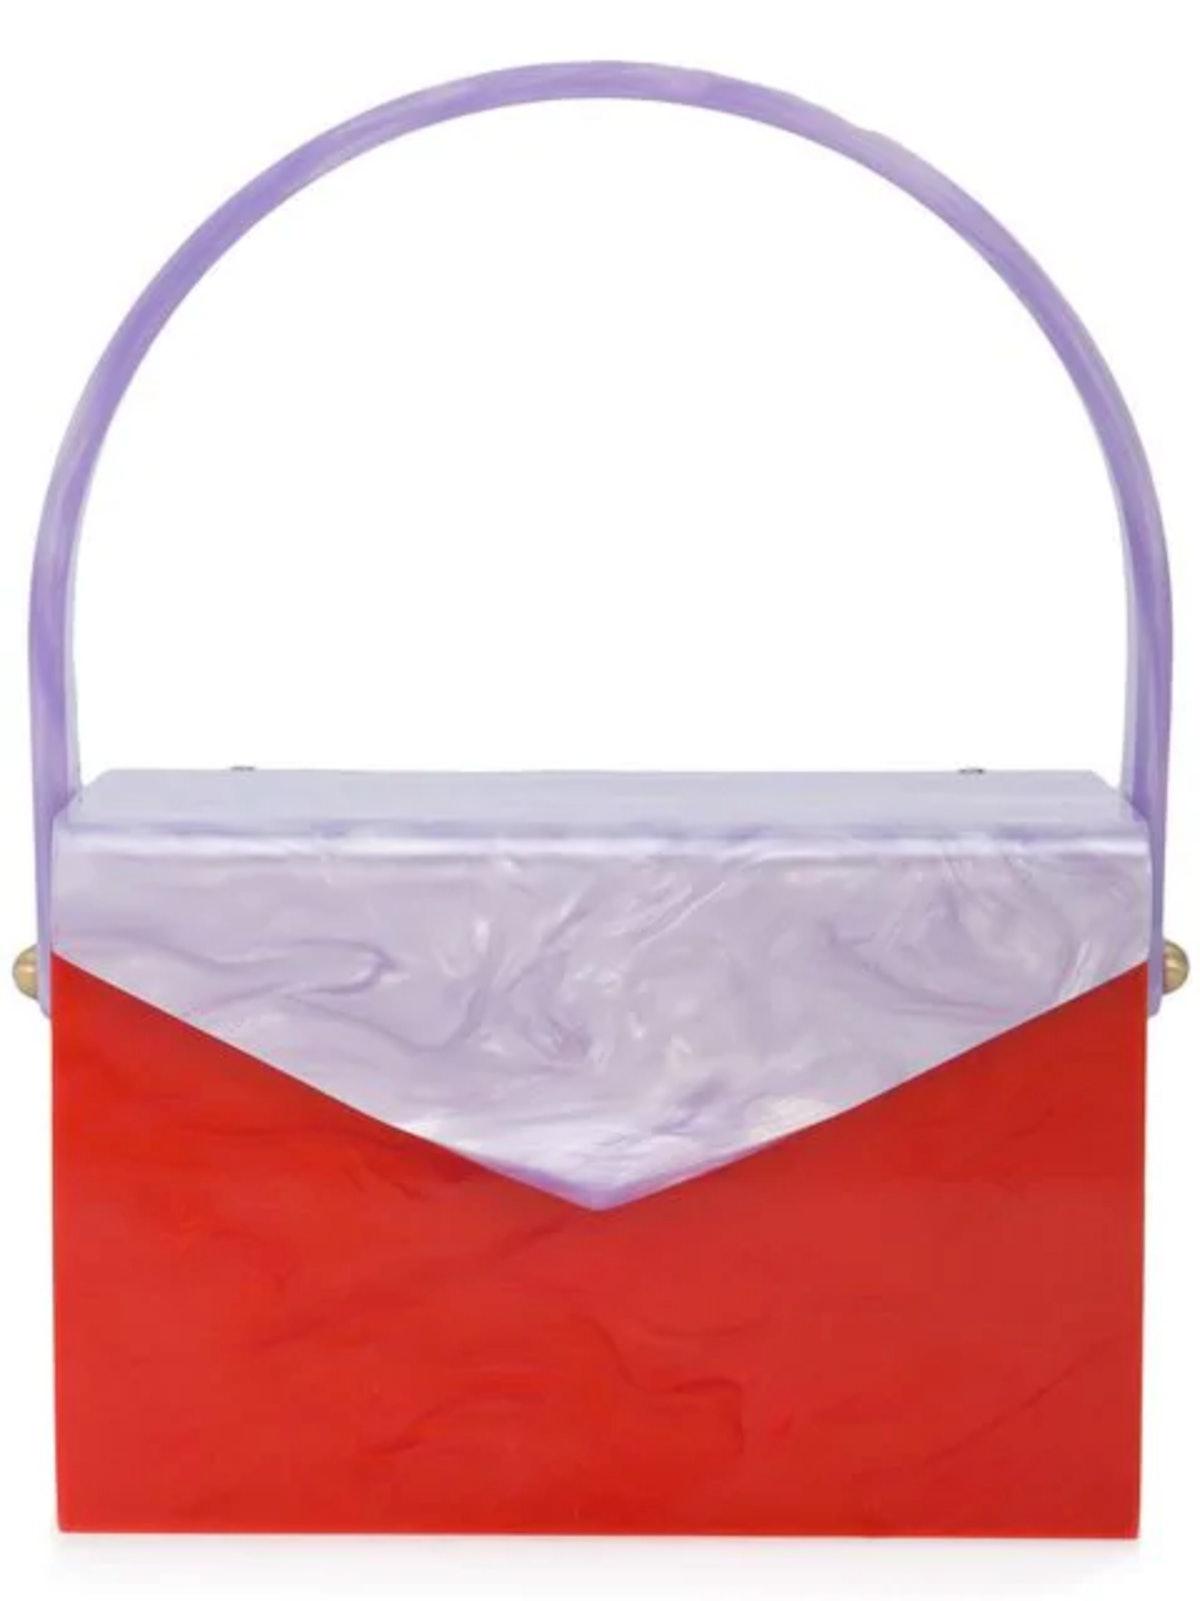 Marbled Clutch Bag